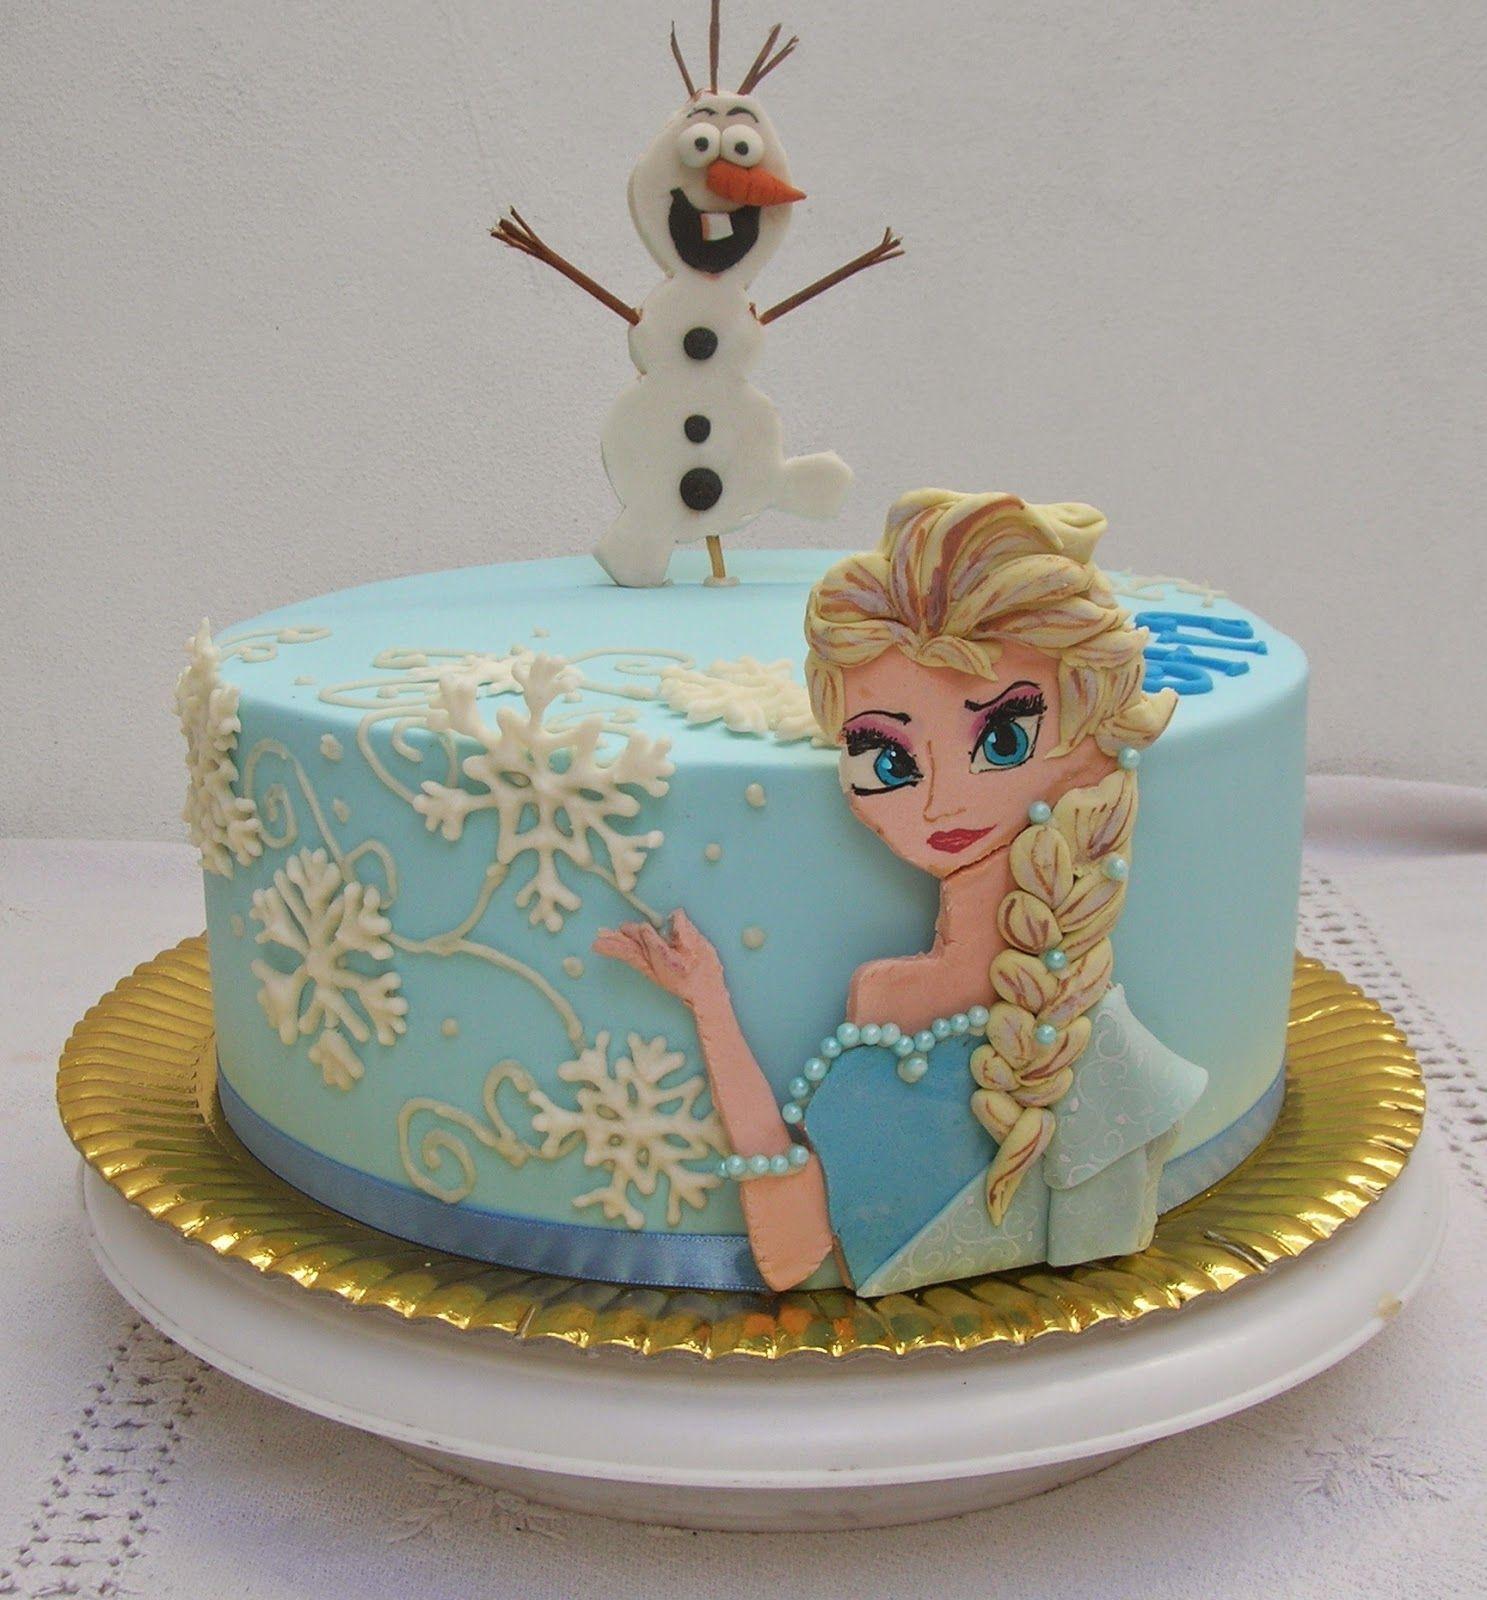 giant cupcake frozen images   Frozen II   Cake decorating ...